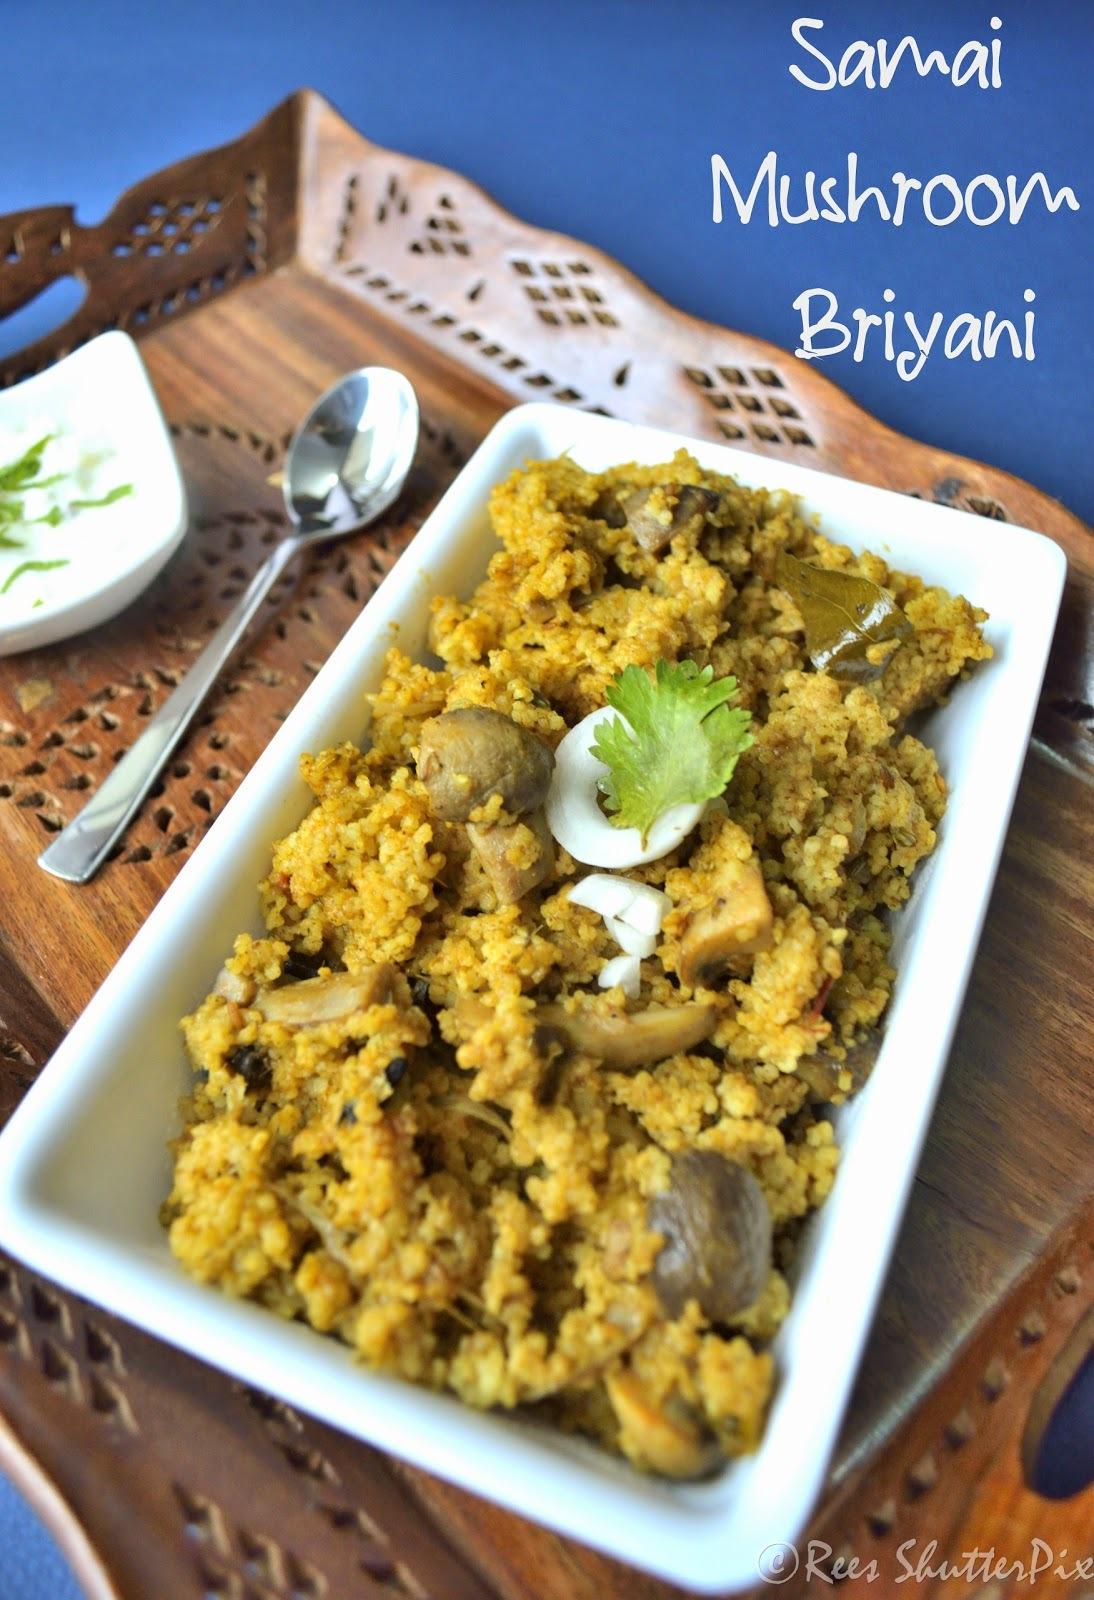 Samai Mushroom Briyani Recipe | Little Millet Mushroom Briyani Recipe | Millet Recipes